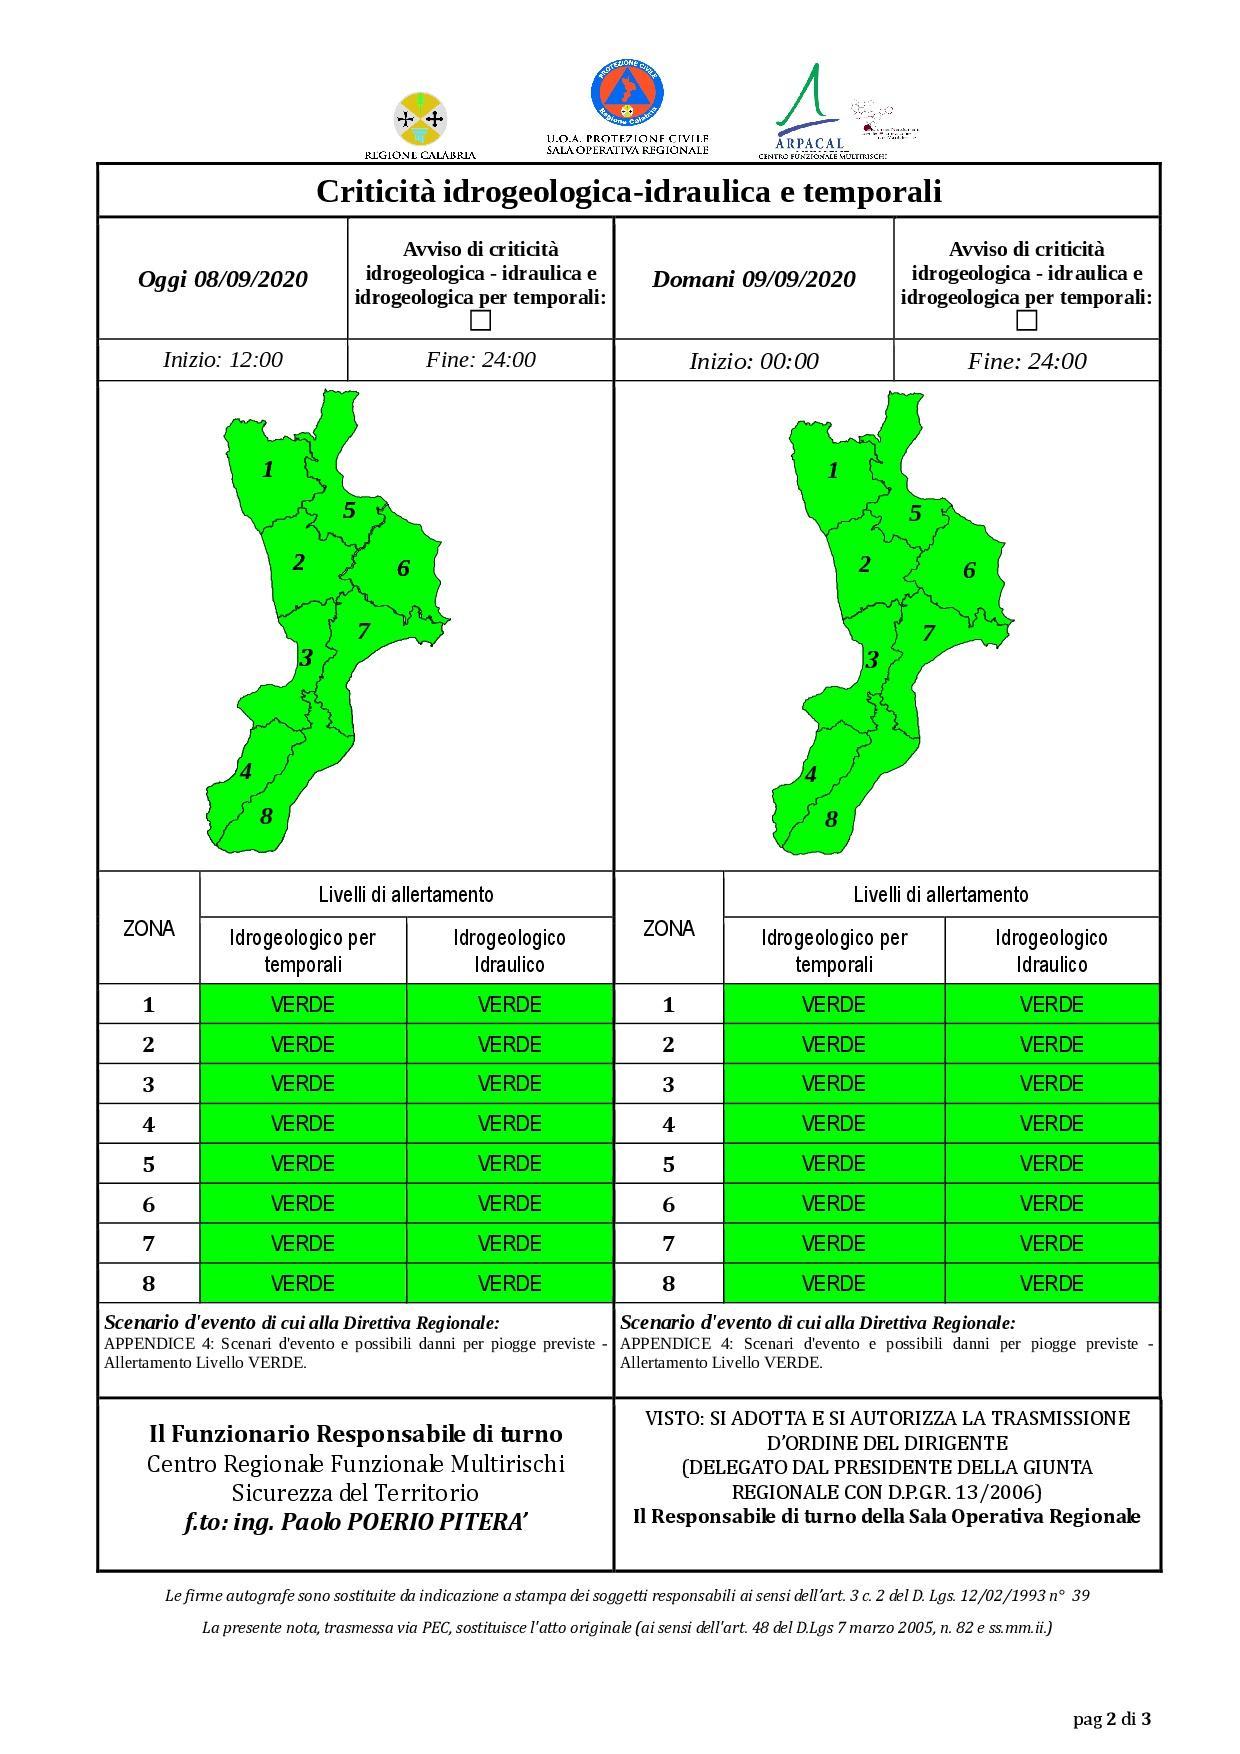 Criticità idrogeologica-idraulica e temporali in Calabria 08-09-2020